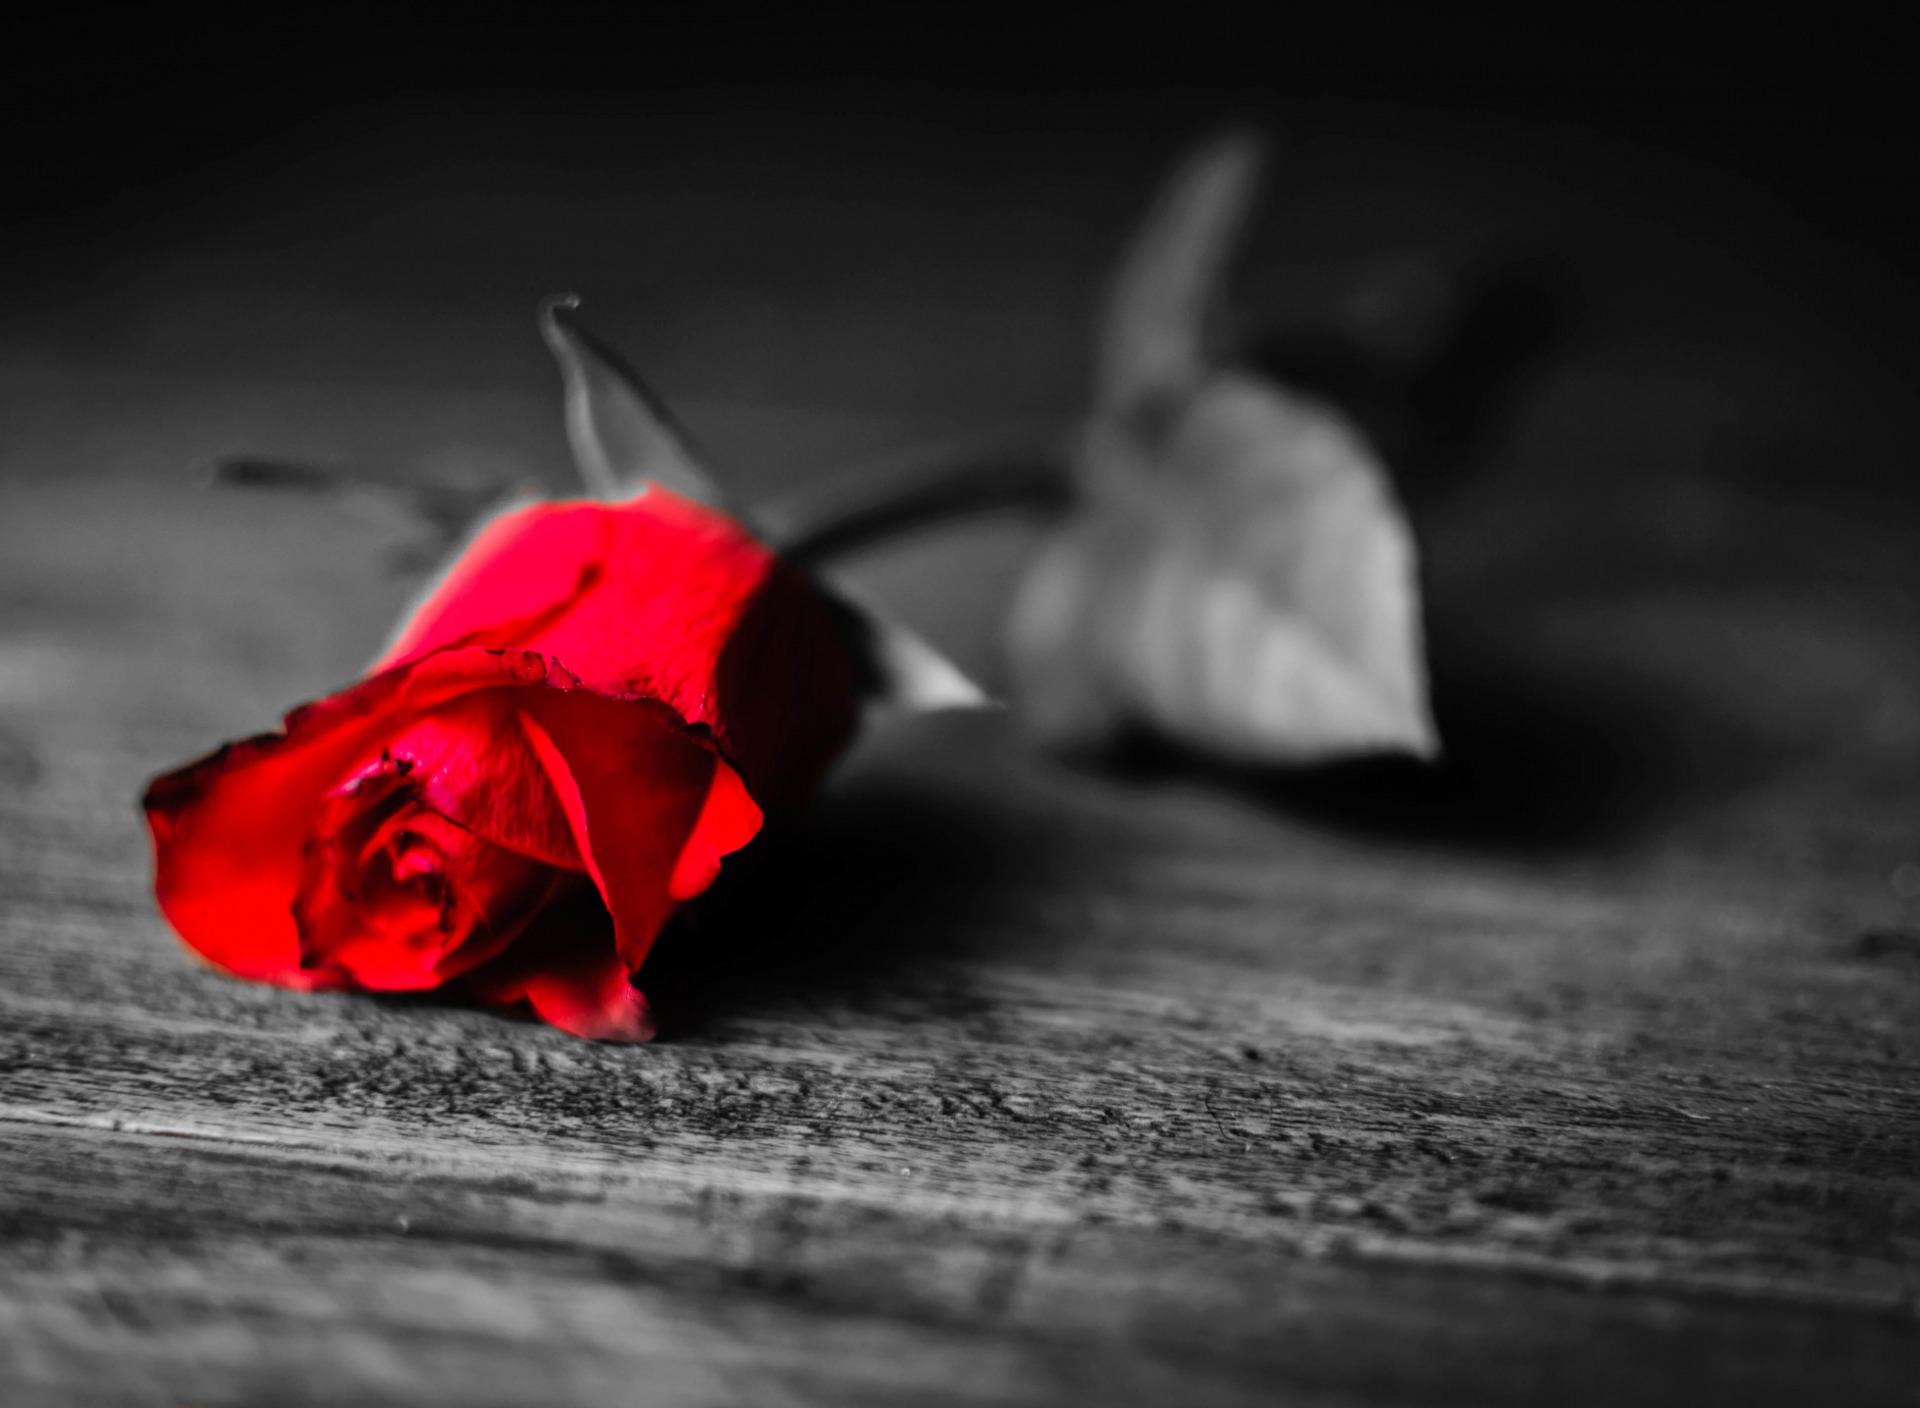 картинки одиночества сердец дмитрия